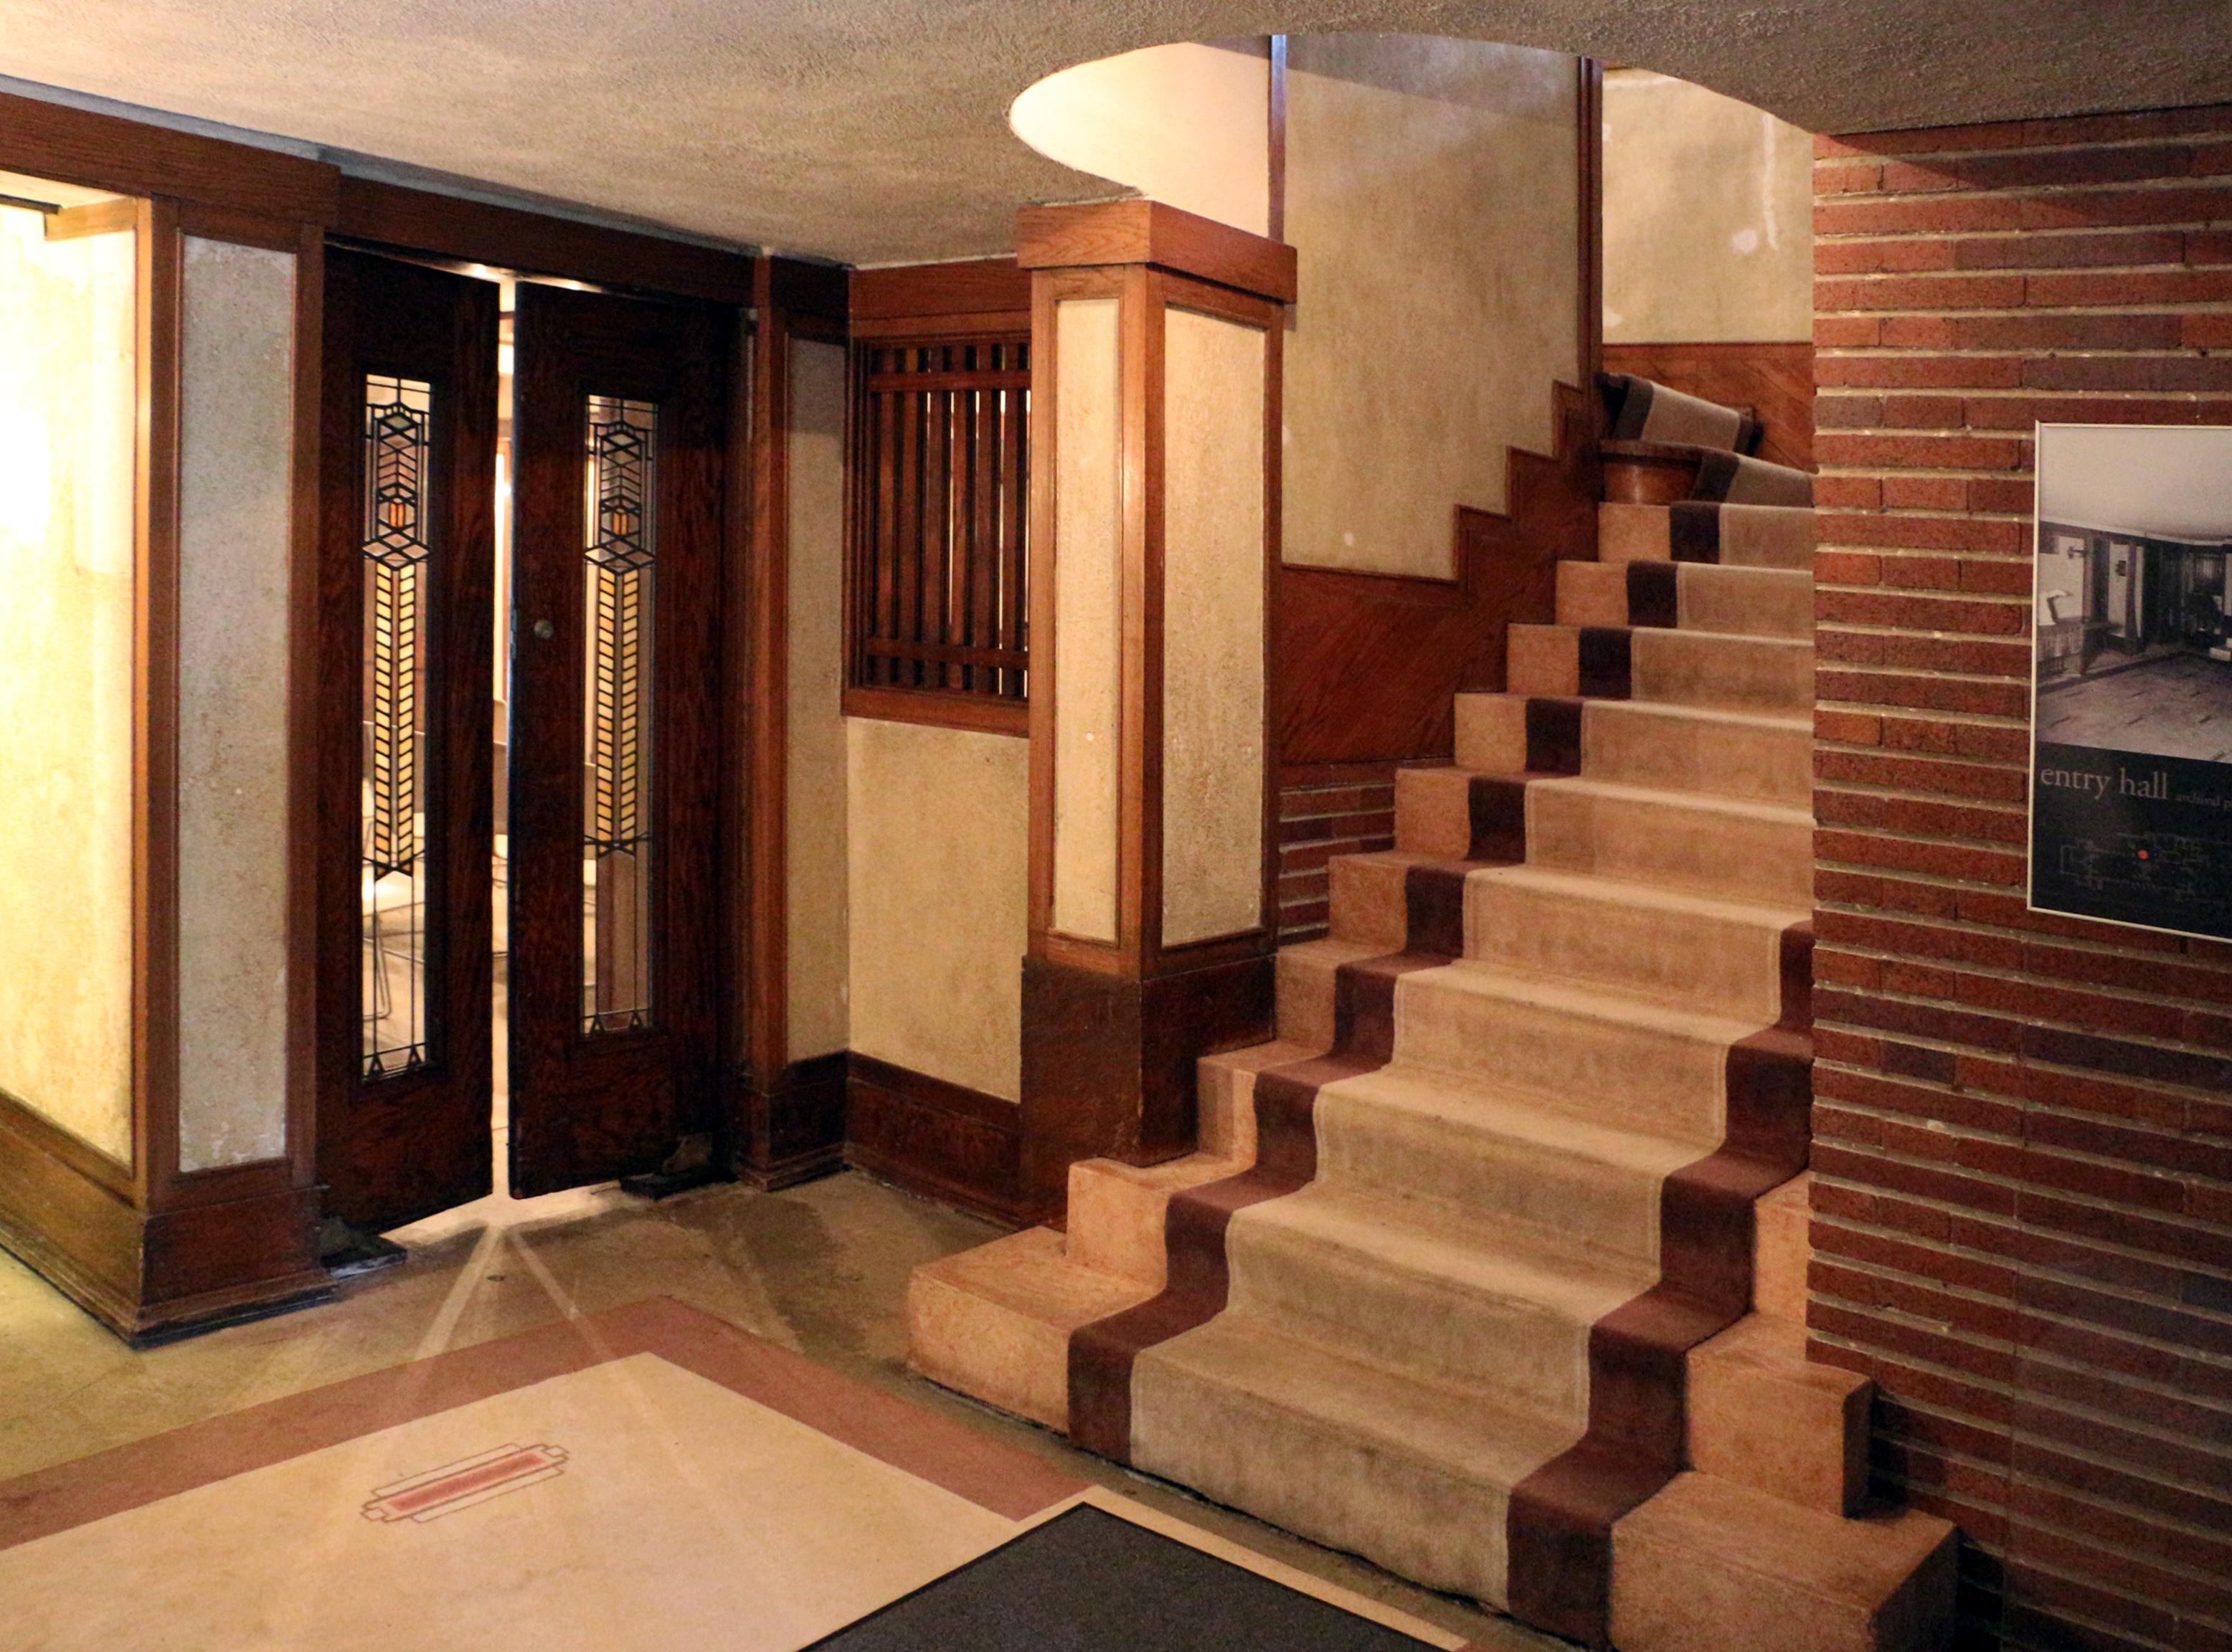 File:Chicago, Robie House Di Frank Lloyd Wright, 1908 1910, Ingresso